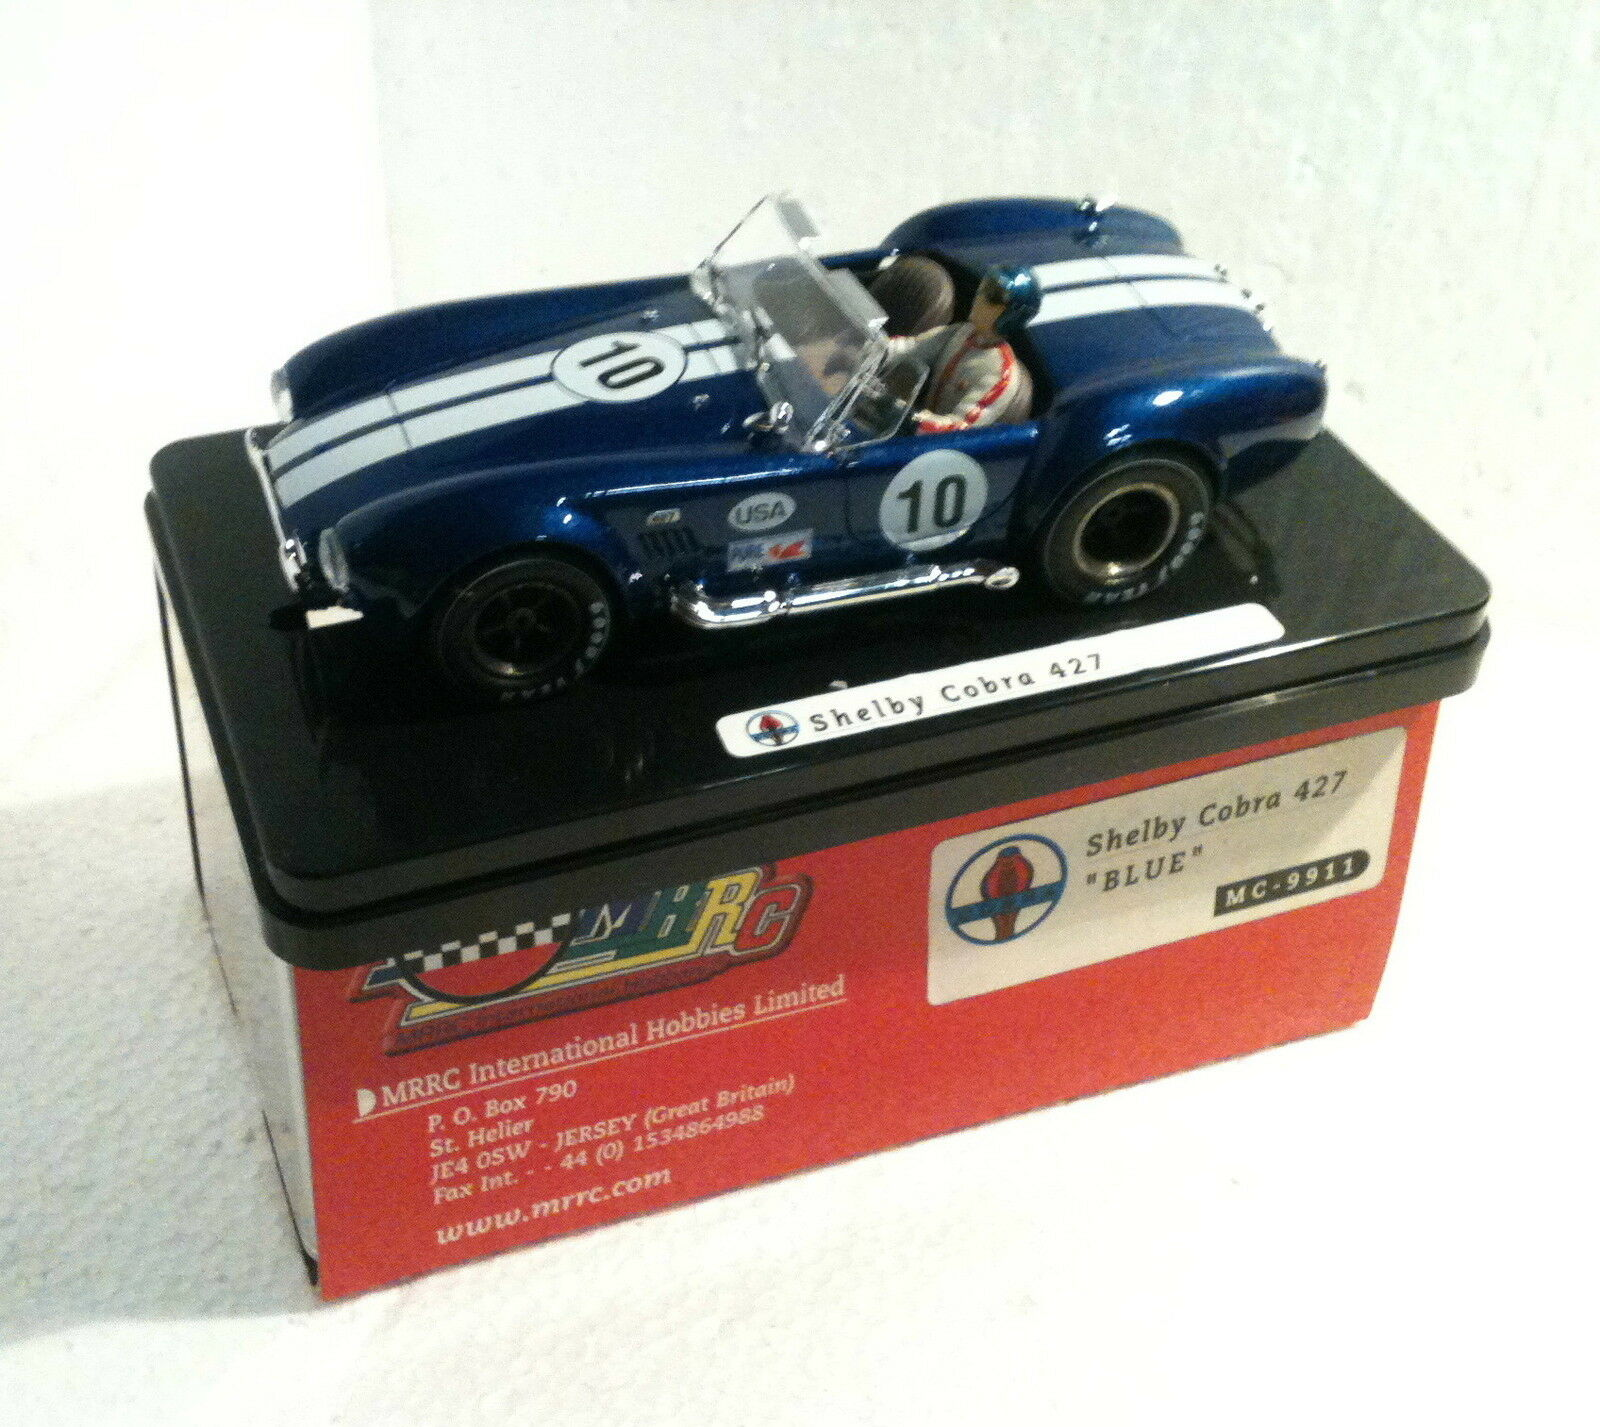 Qq MC9911 MRRC SHELBY COBRA 427   10 Blau